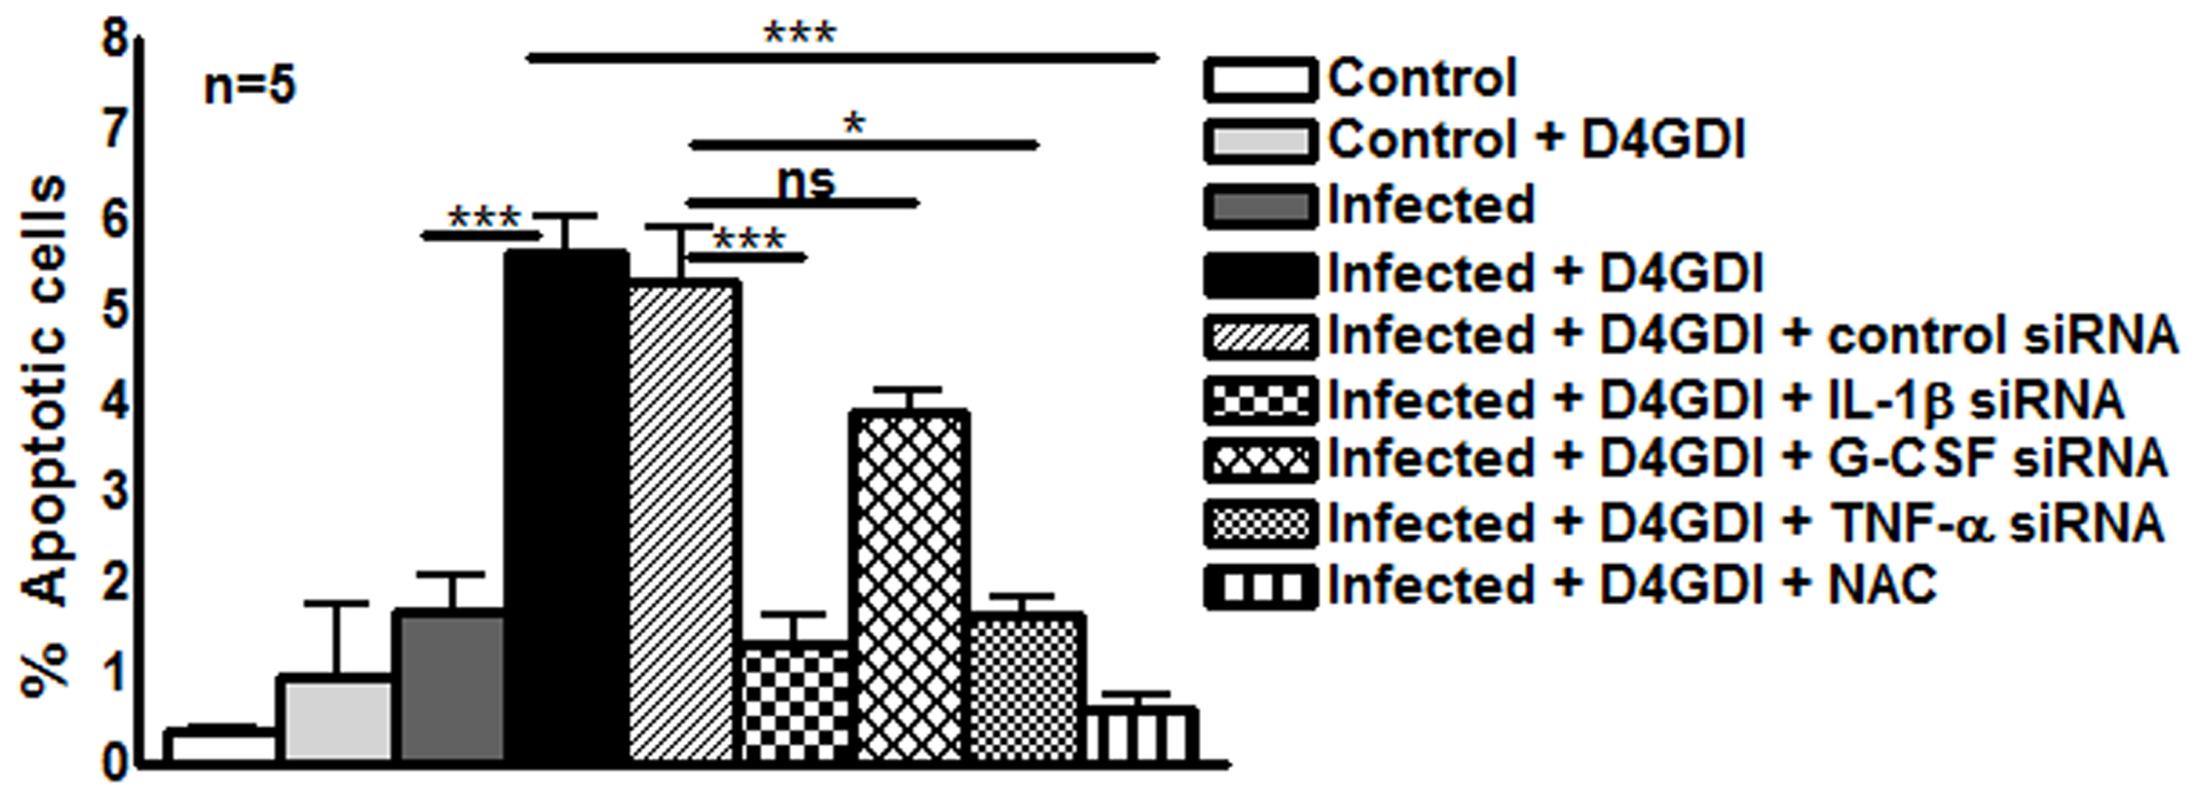 D4GDI enhances apoptosis of <i>M. tb</i>-infected MDMs.